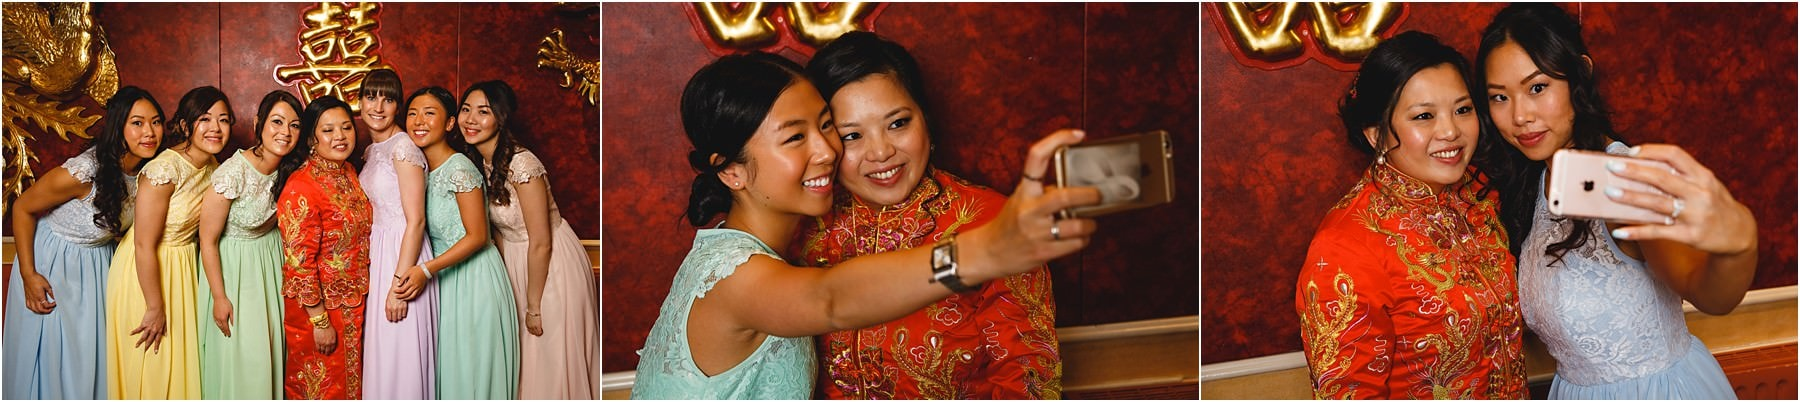 Chinese_Wedding_Photography_0038